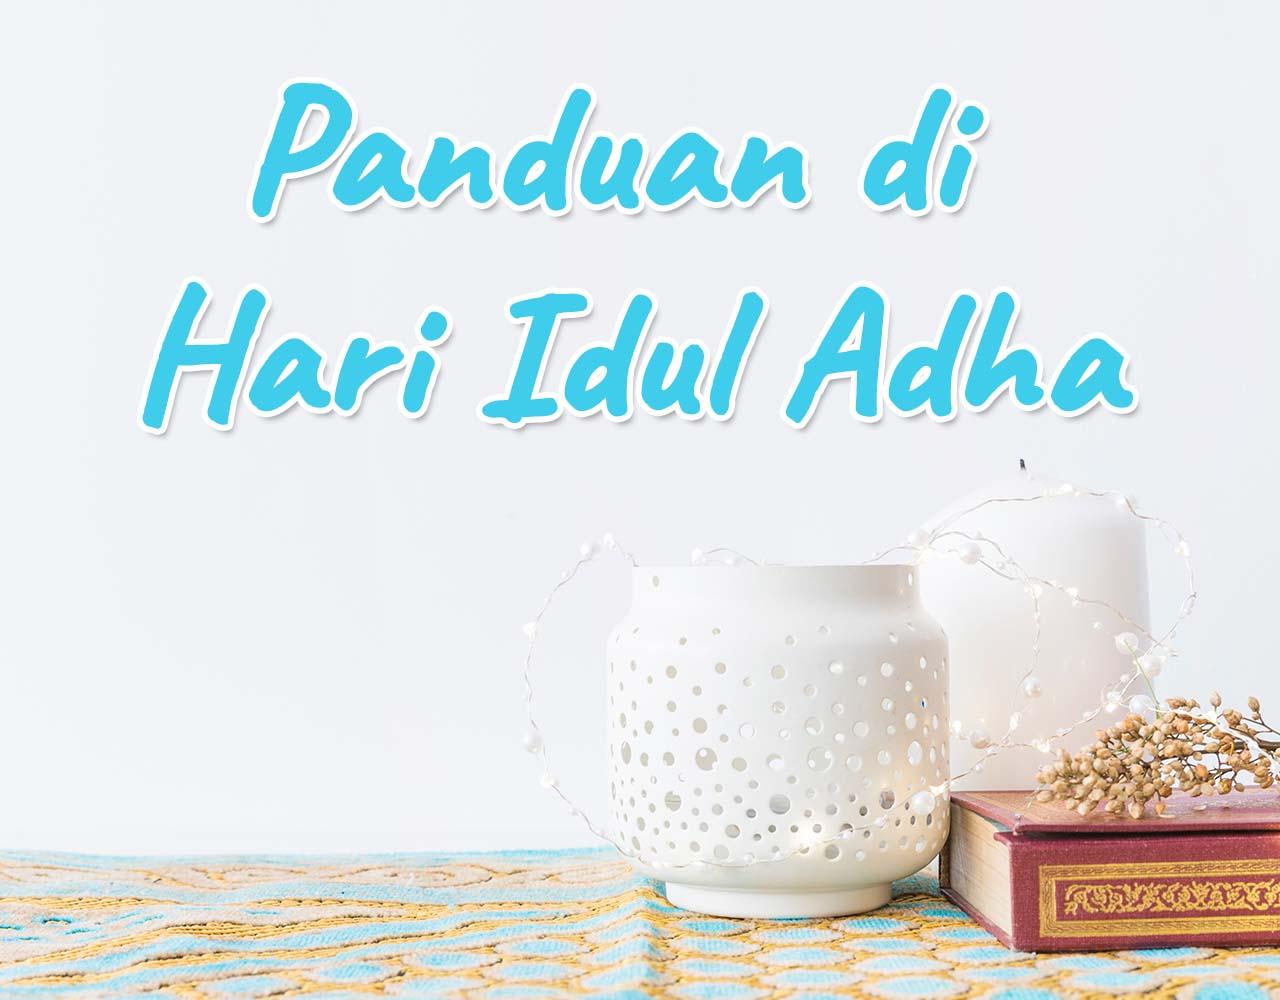 Khutbah Jumat - Panduan di Hari Idul Adha